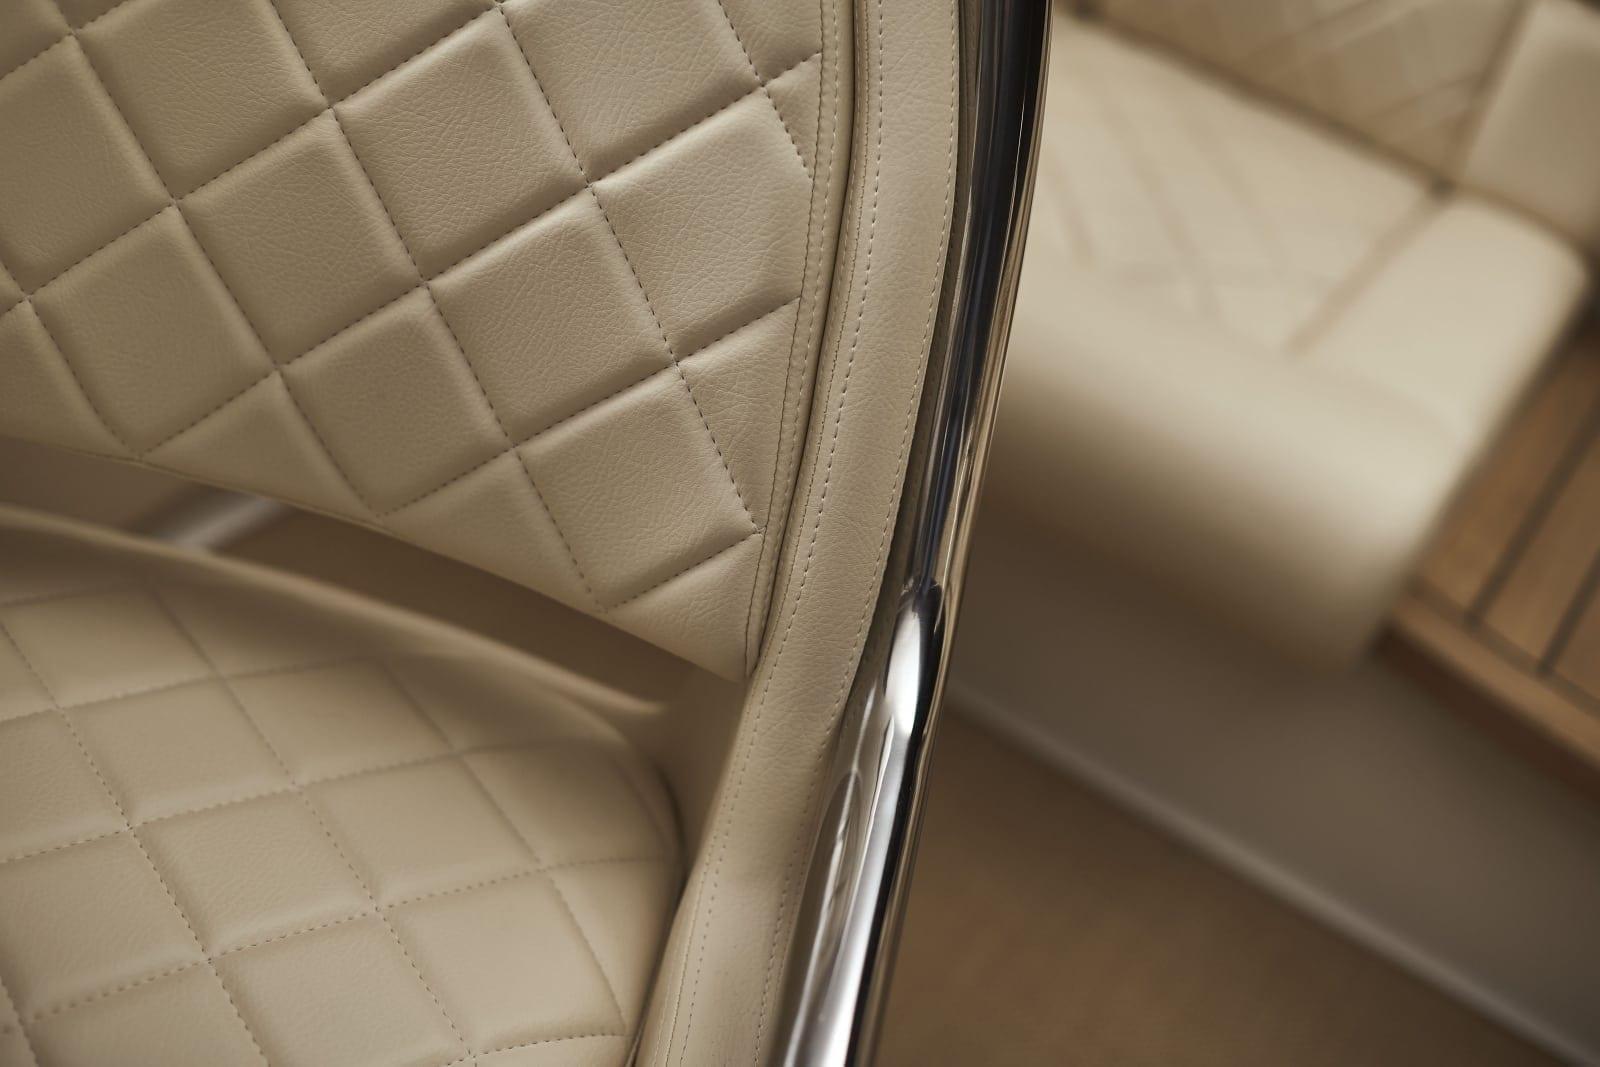 Chris Craft Capri 27 Seat Detail